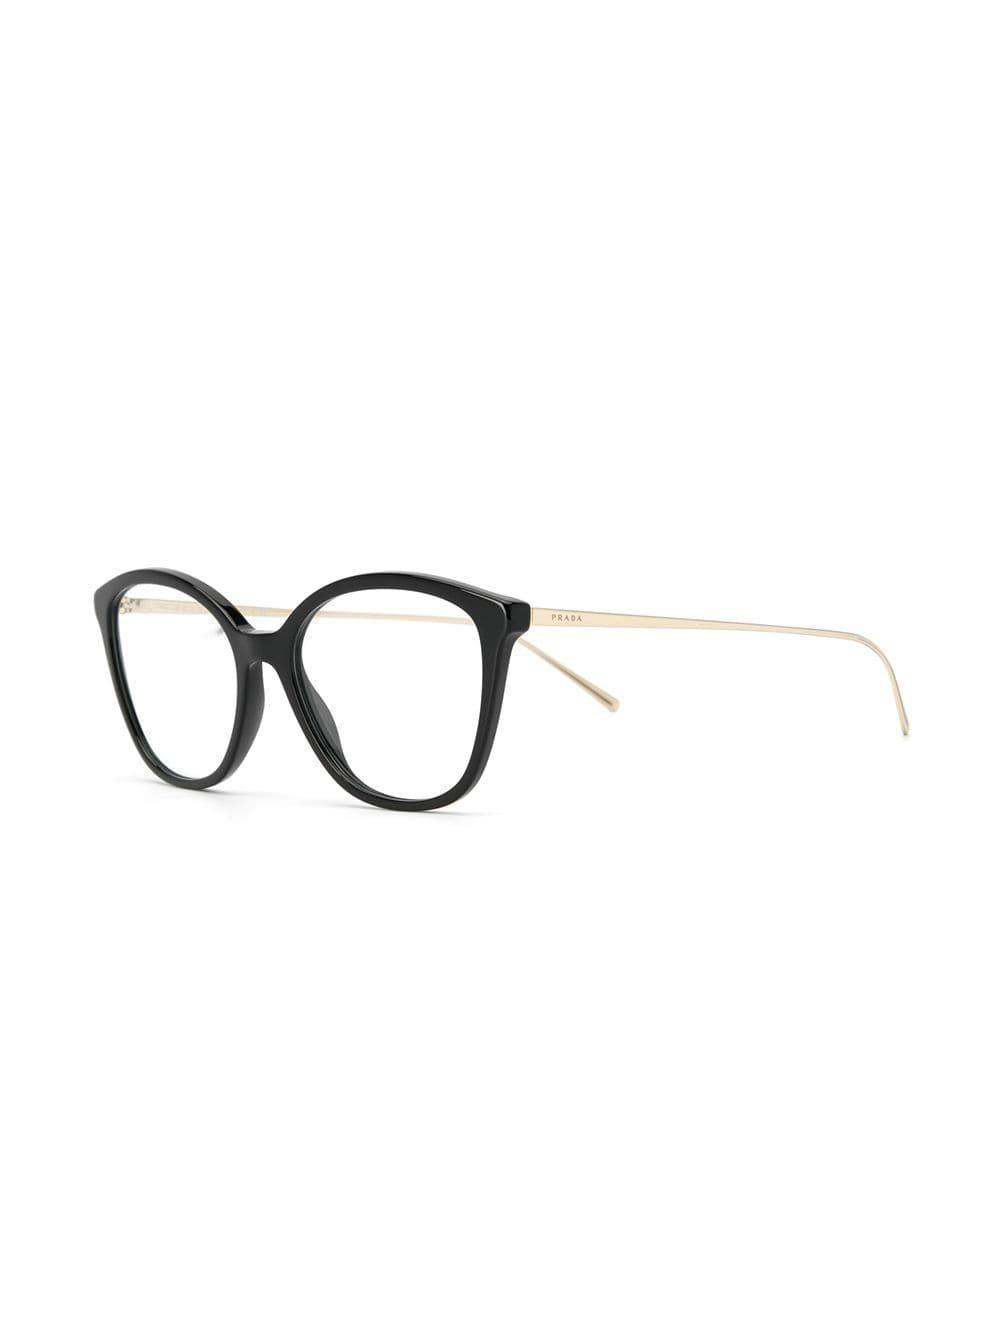 bea58ff95cc6 Lyst - Prada Square-frame Glasses in Black